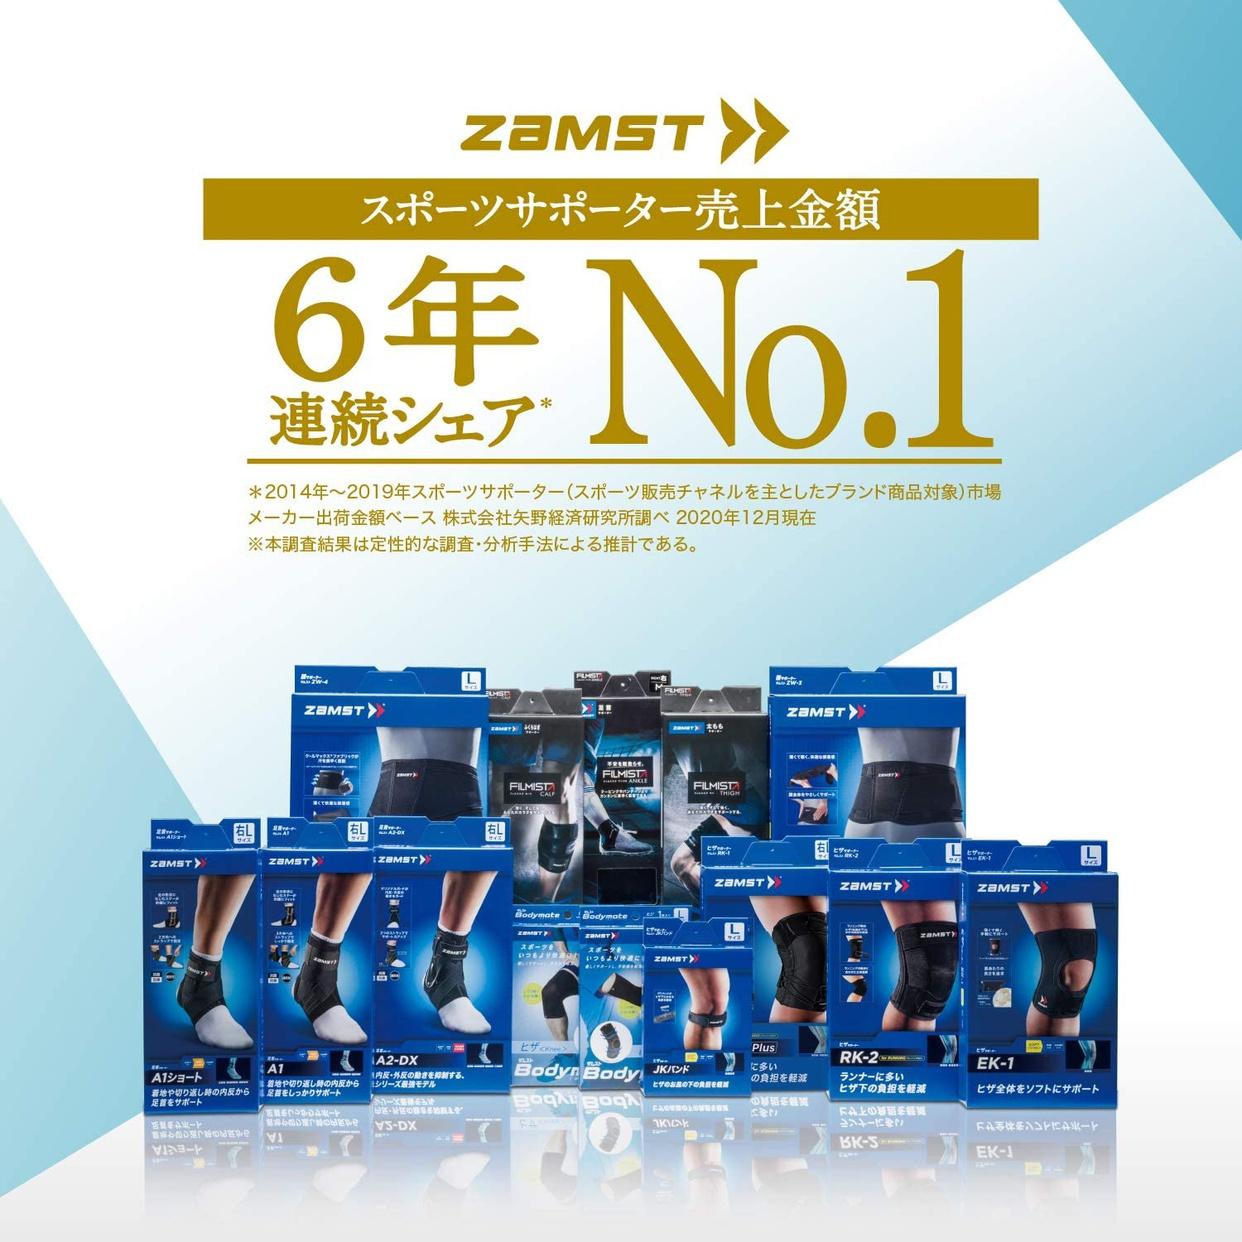 ZAMST(ザムスト) 膝用サポーター RK-1Plusの商品画像2